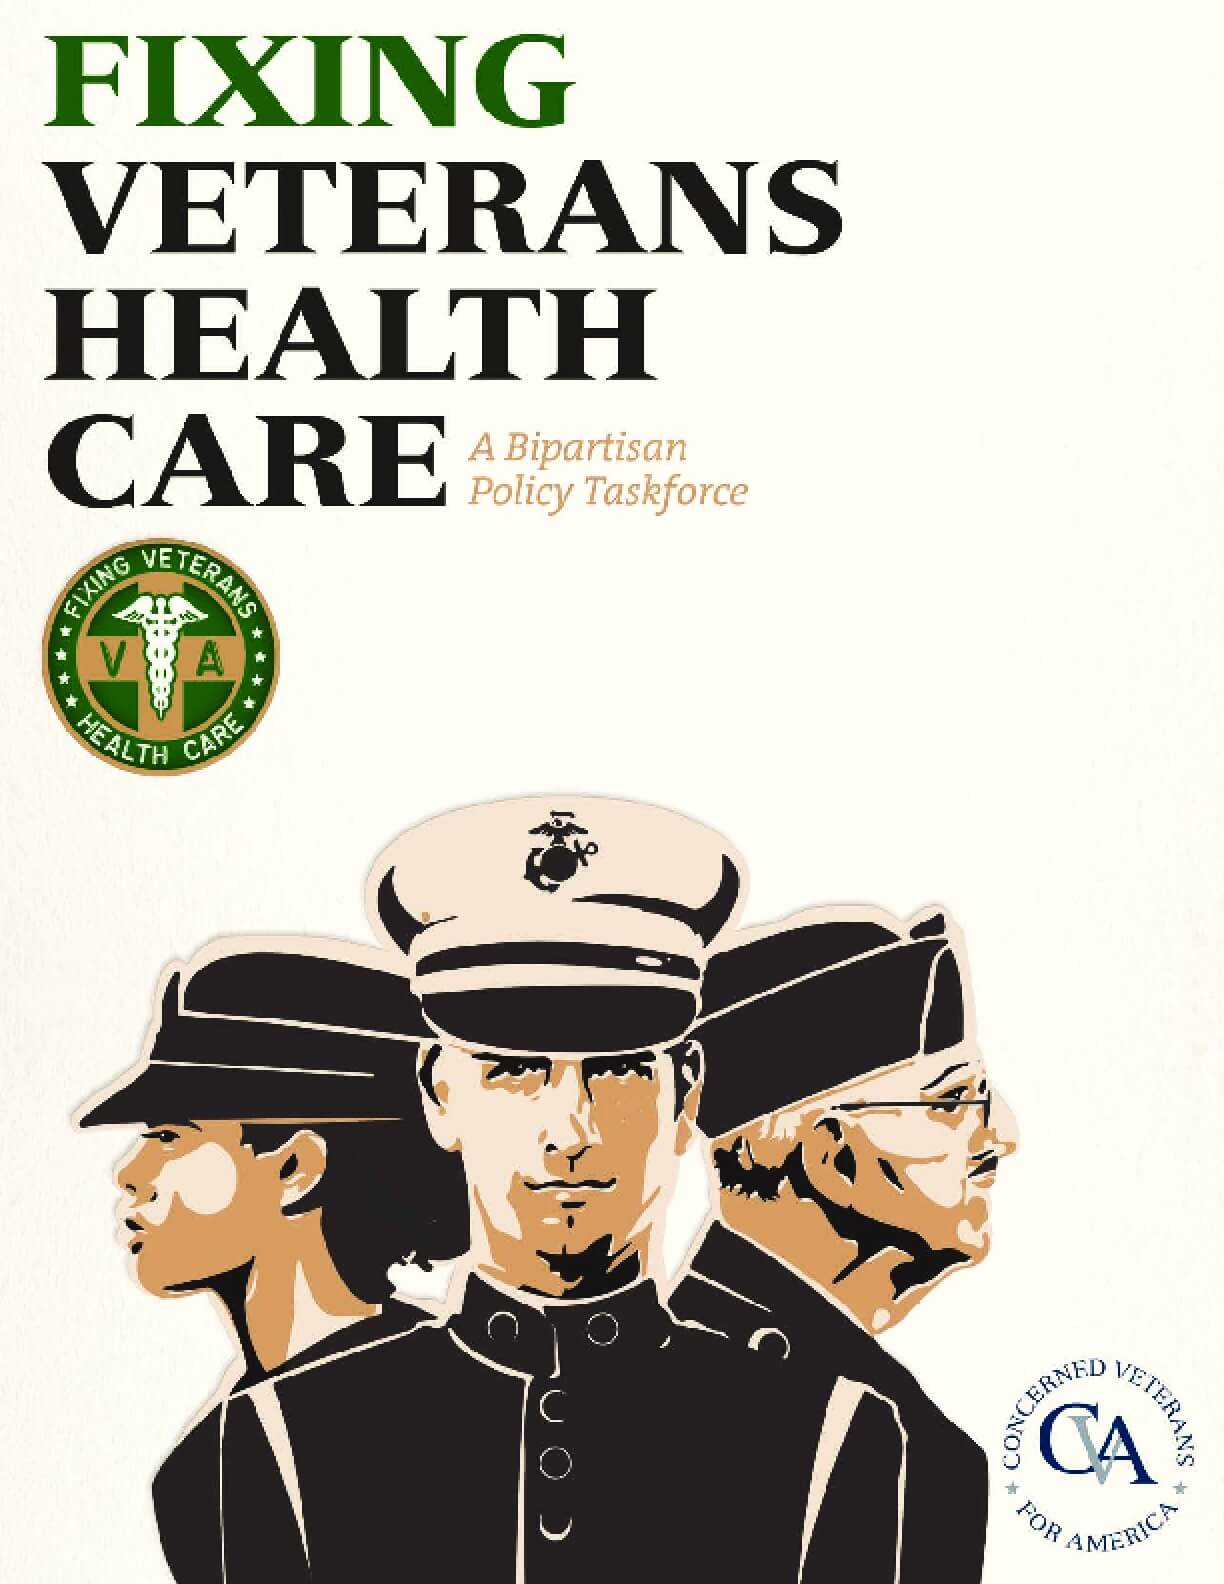 Fixing Veterans Health Care